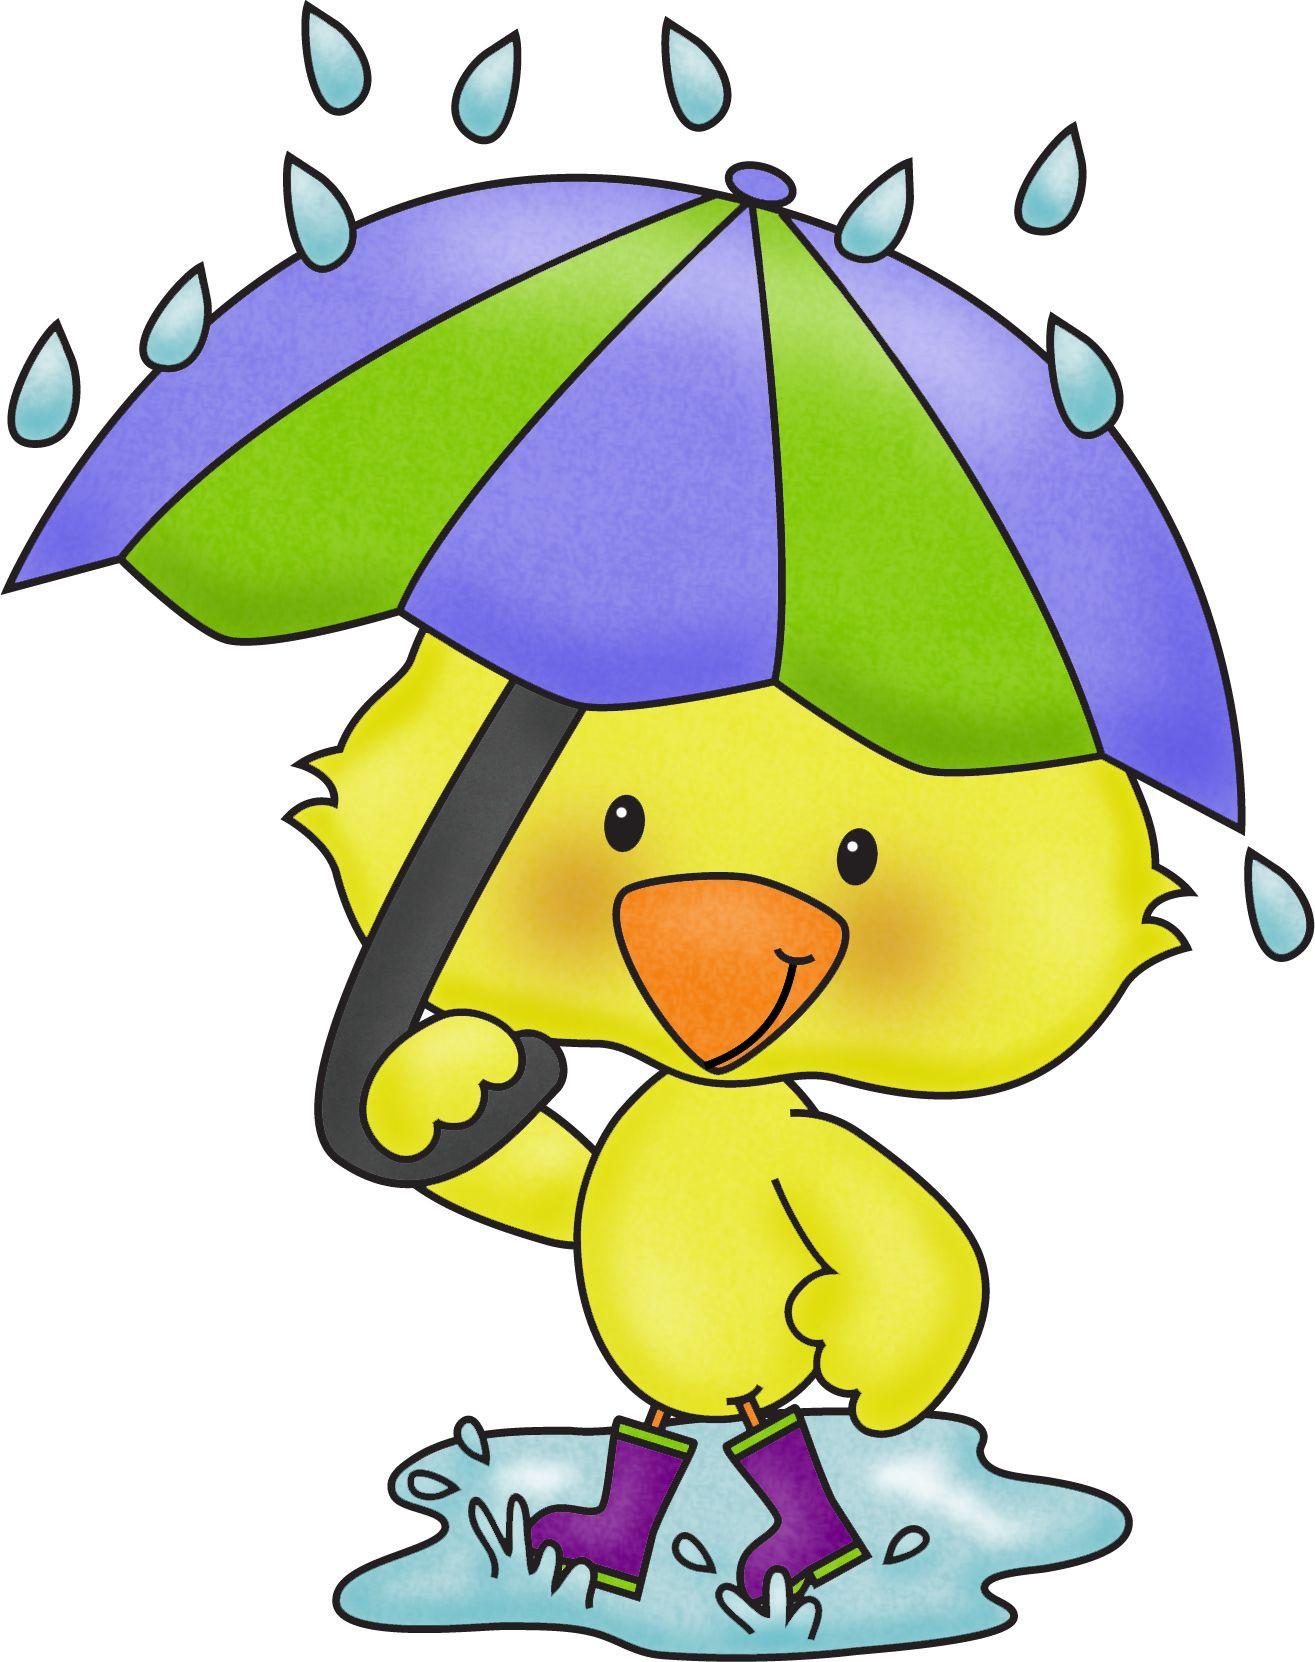 april clipart at getdrawings com free for personal use april rh getdrawings com